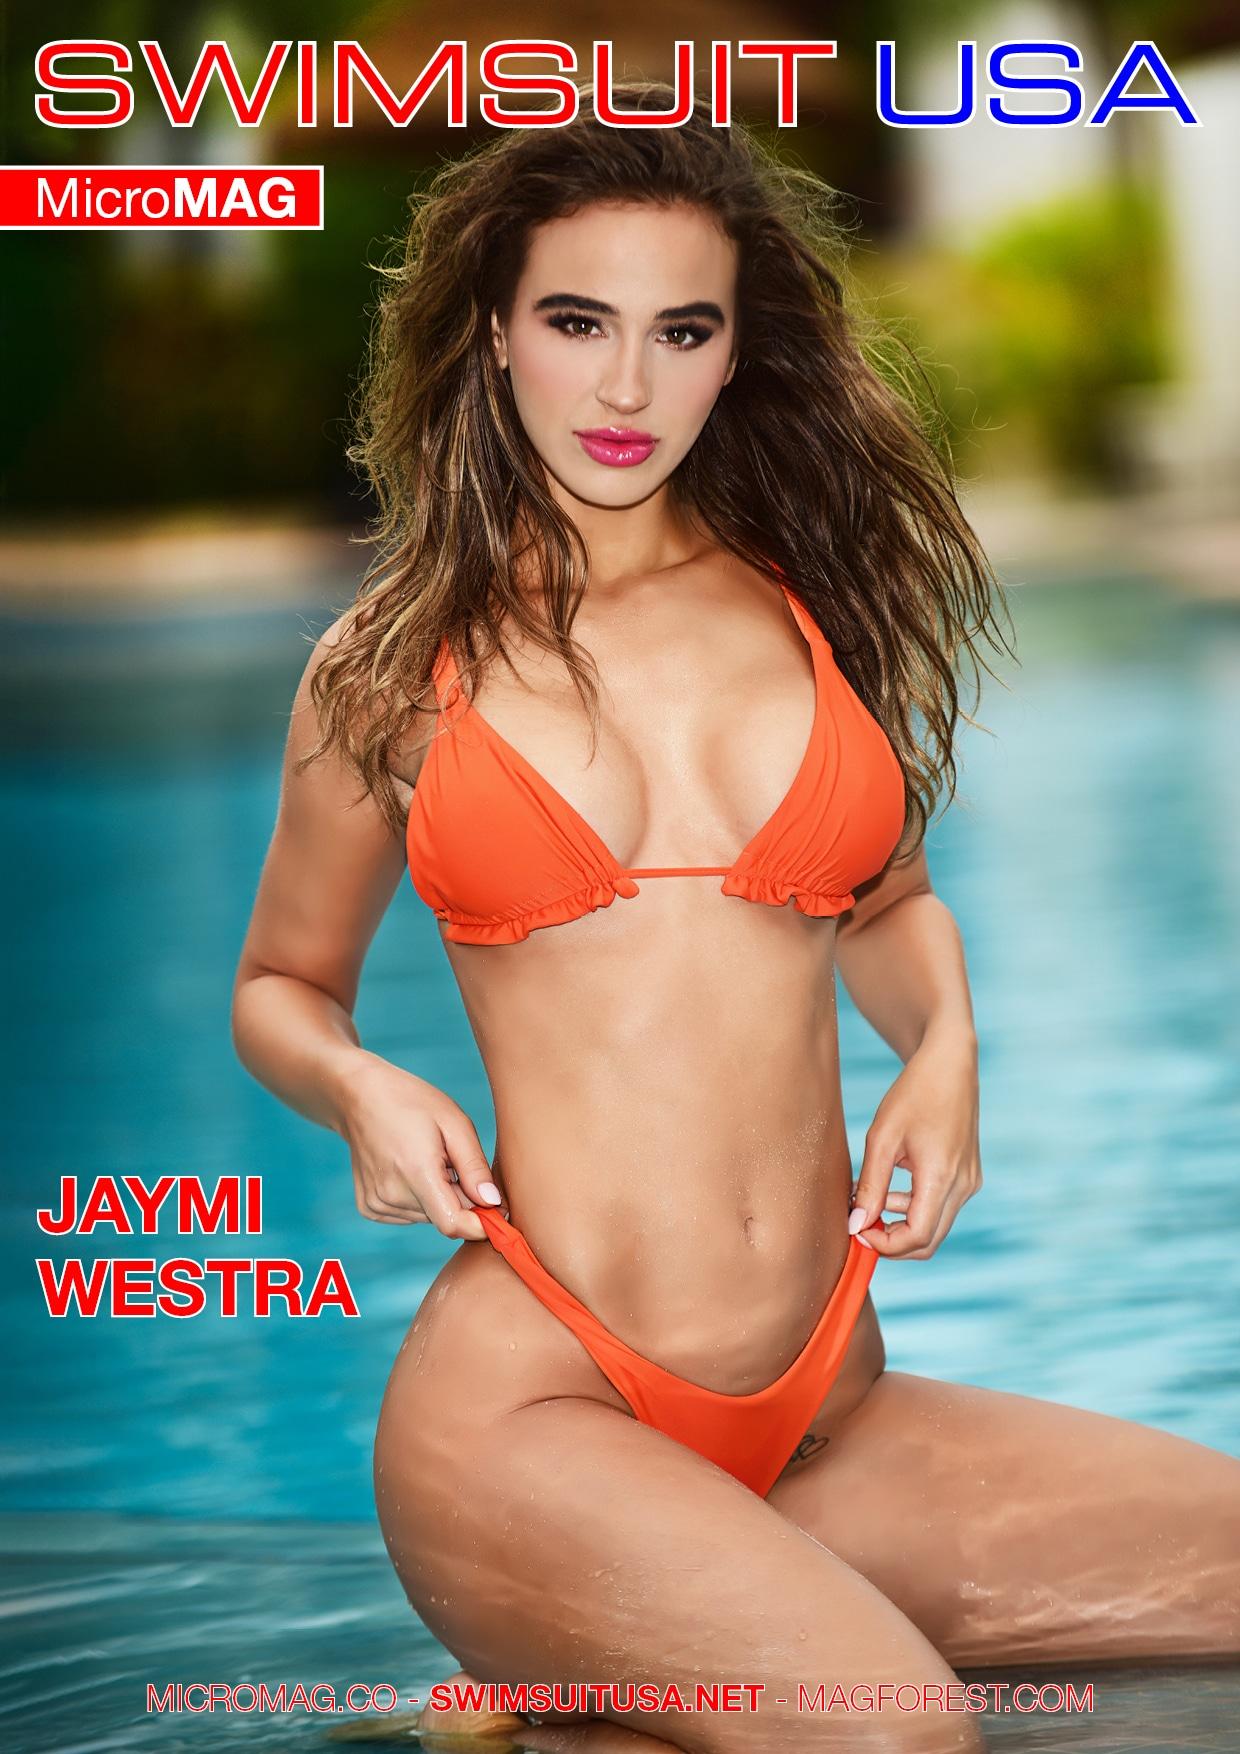 Swimsuit USA MicroMAG - Jaymi Westra